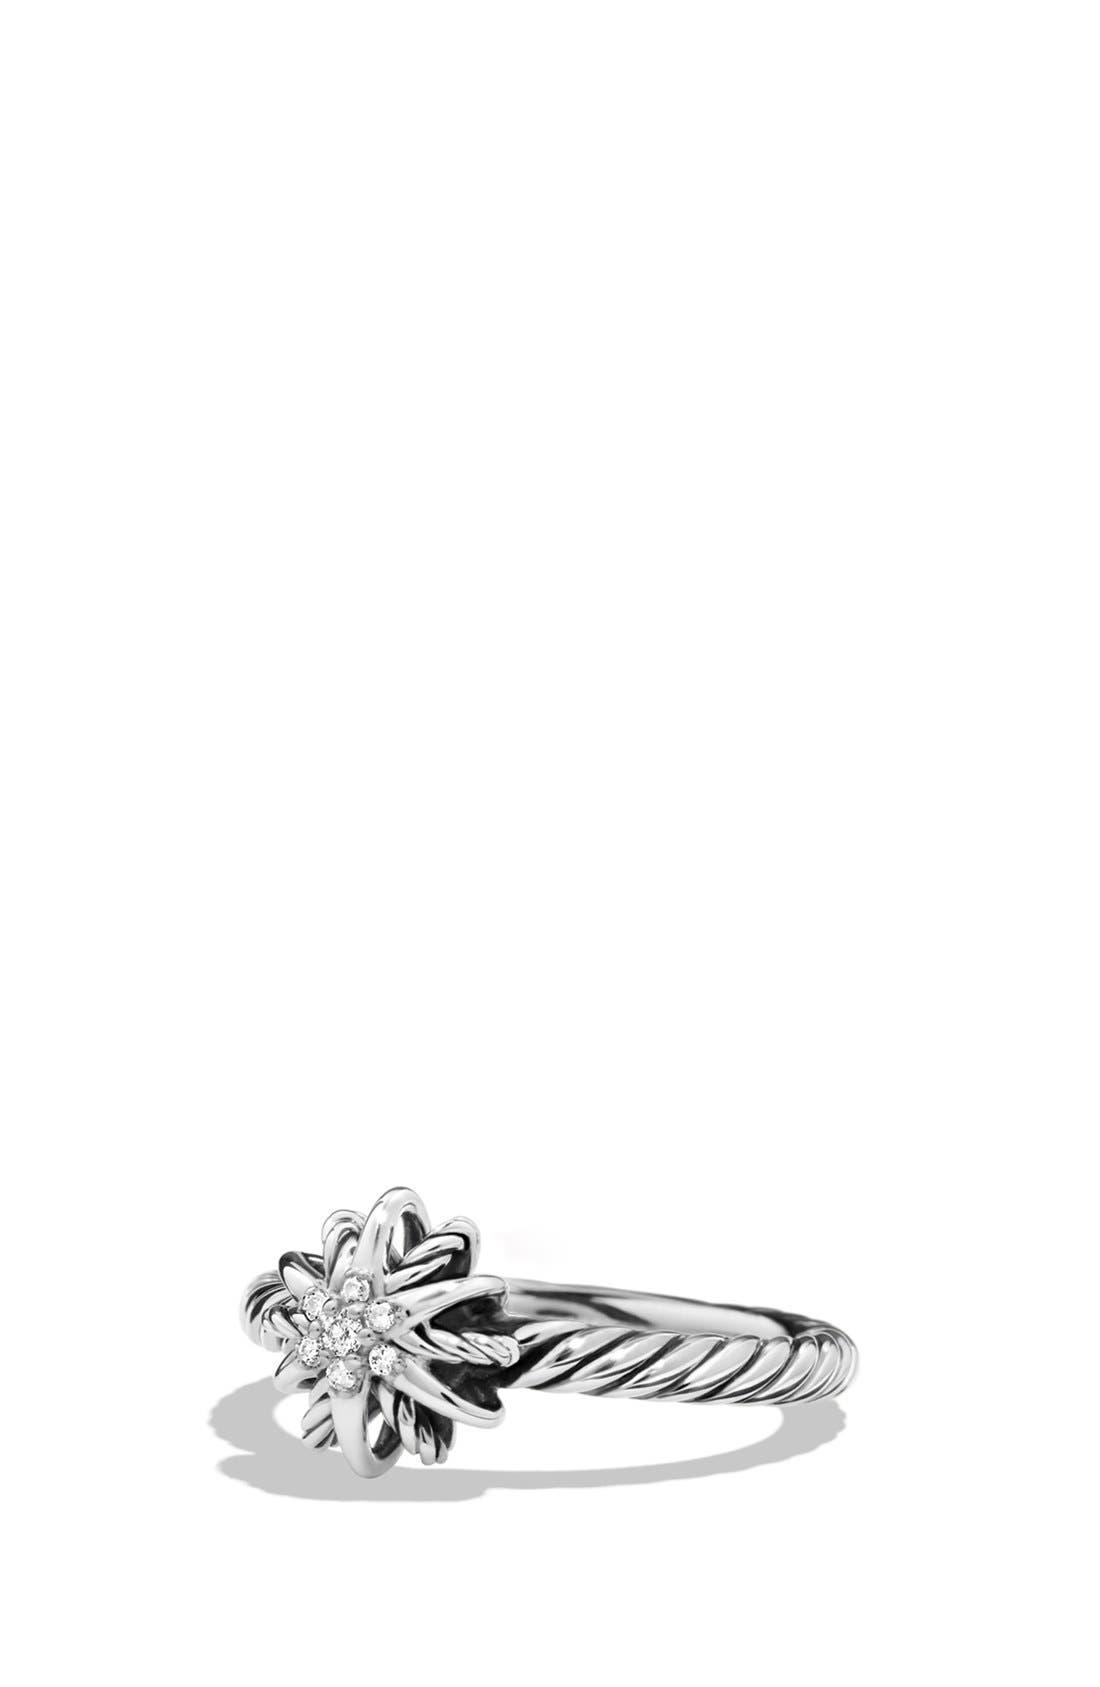 'Starburst' Ring with Diamonds,                             Main thumbnail 1, color,                             DIAMOND